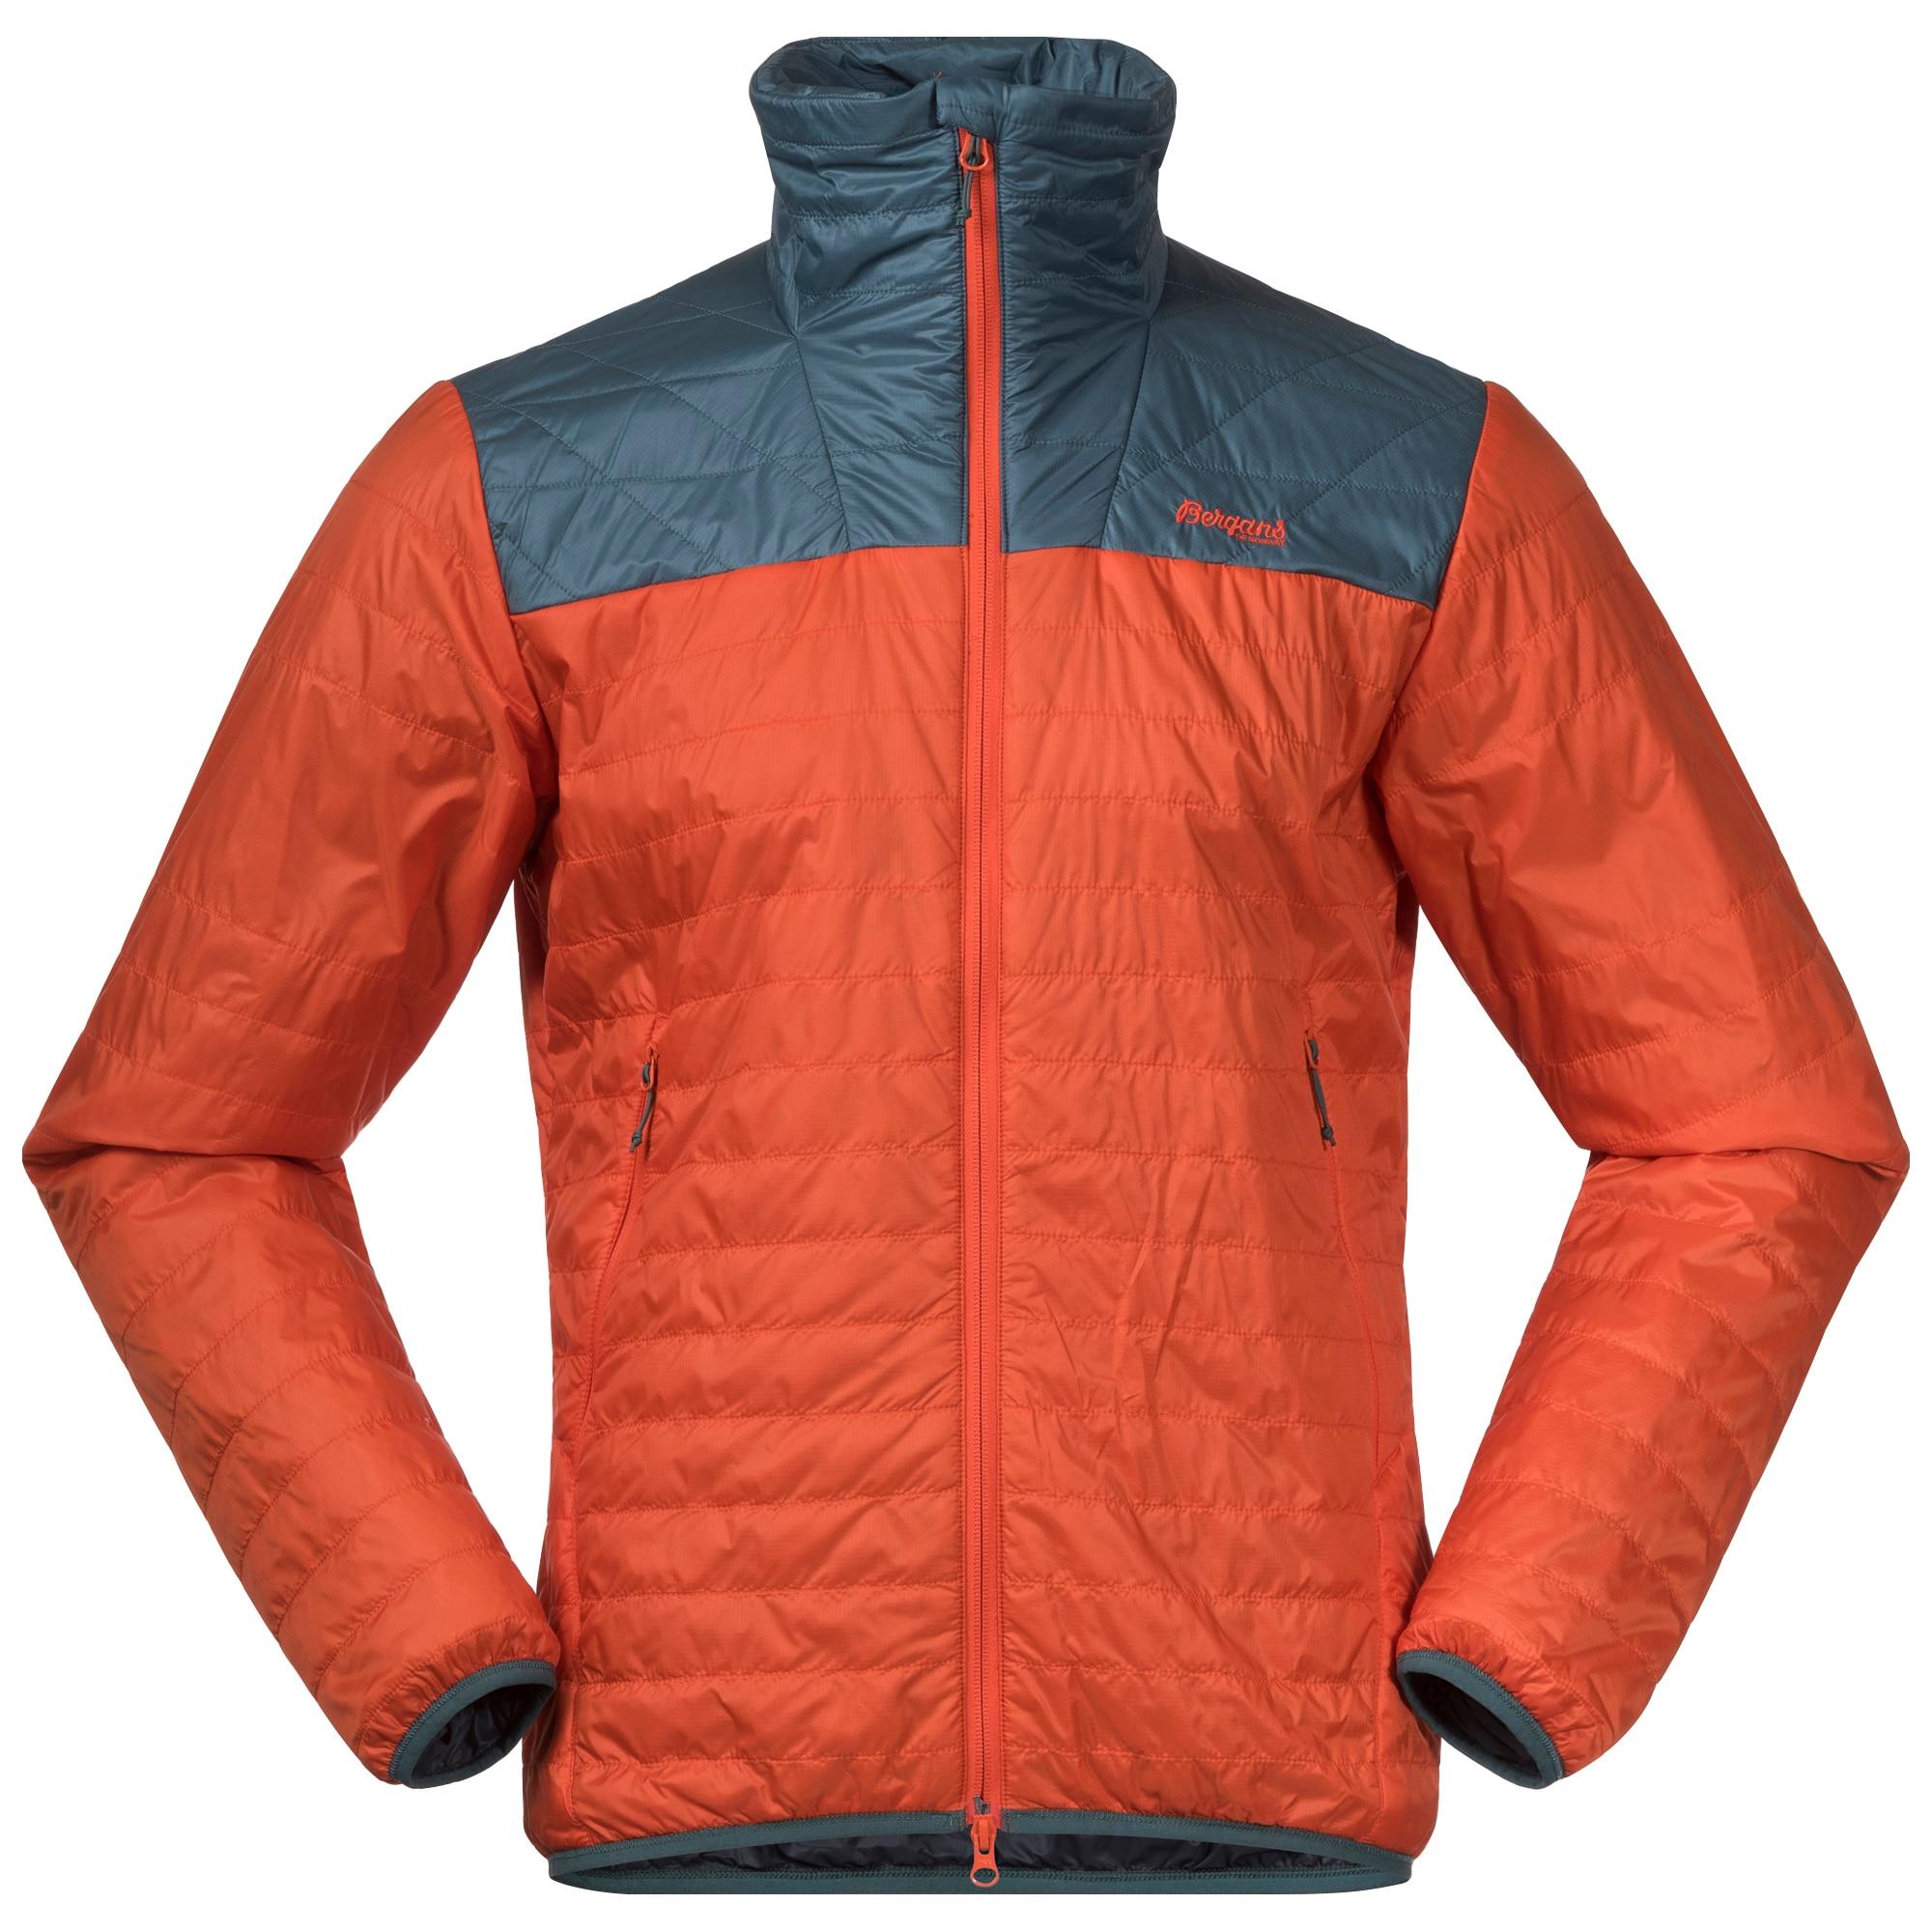 Røros Light Insulated Jacket